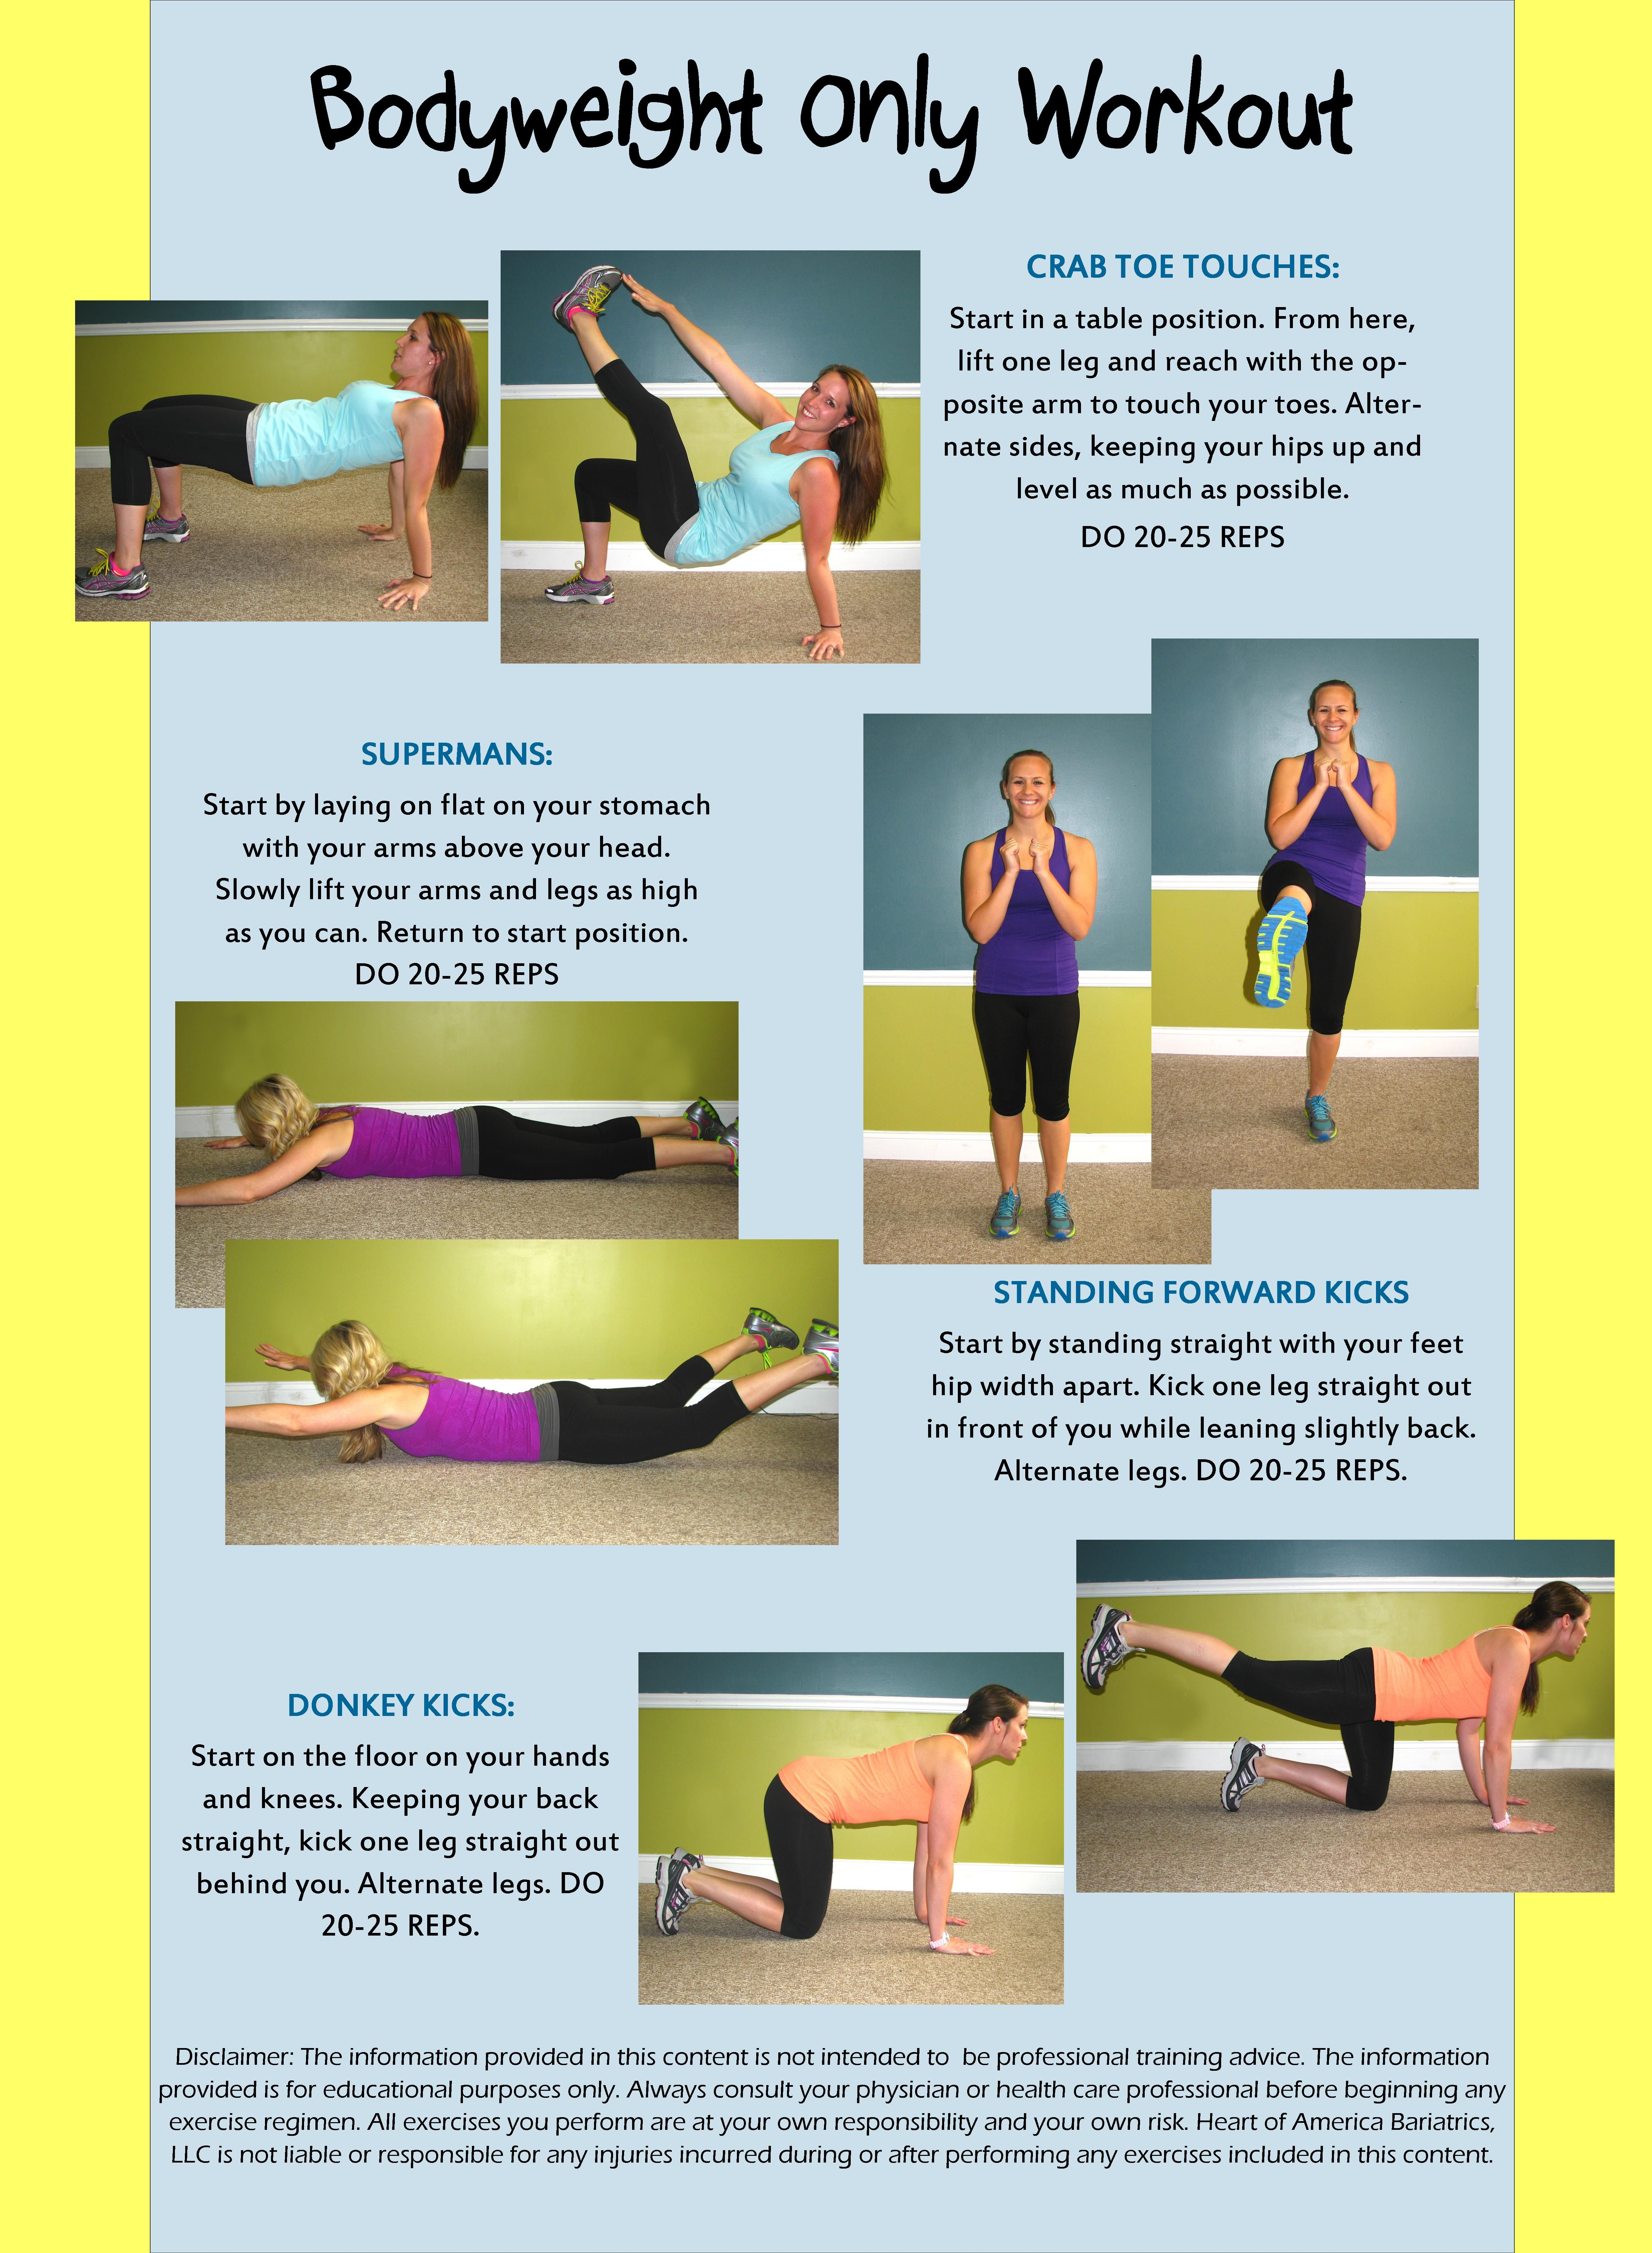 Heart Of America Bariatrics St Louis Wednesday Workout Workout Alphabet Workout